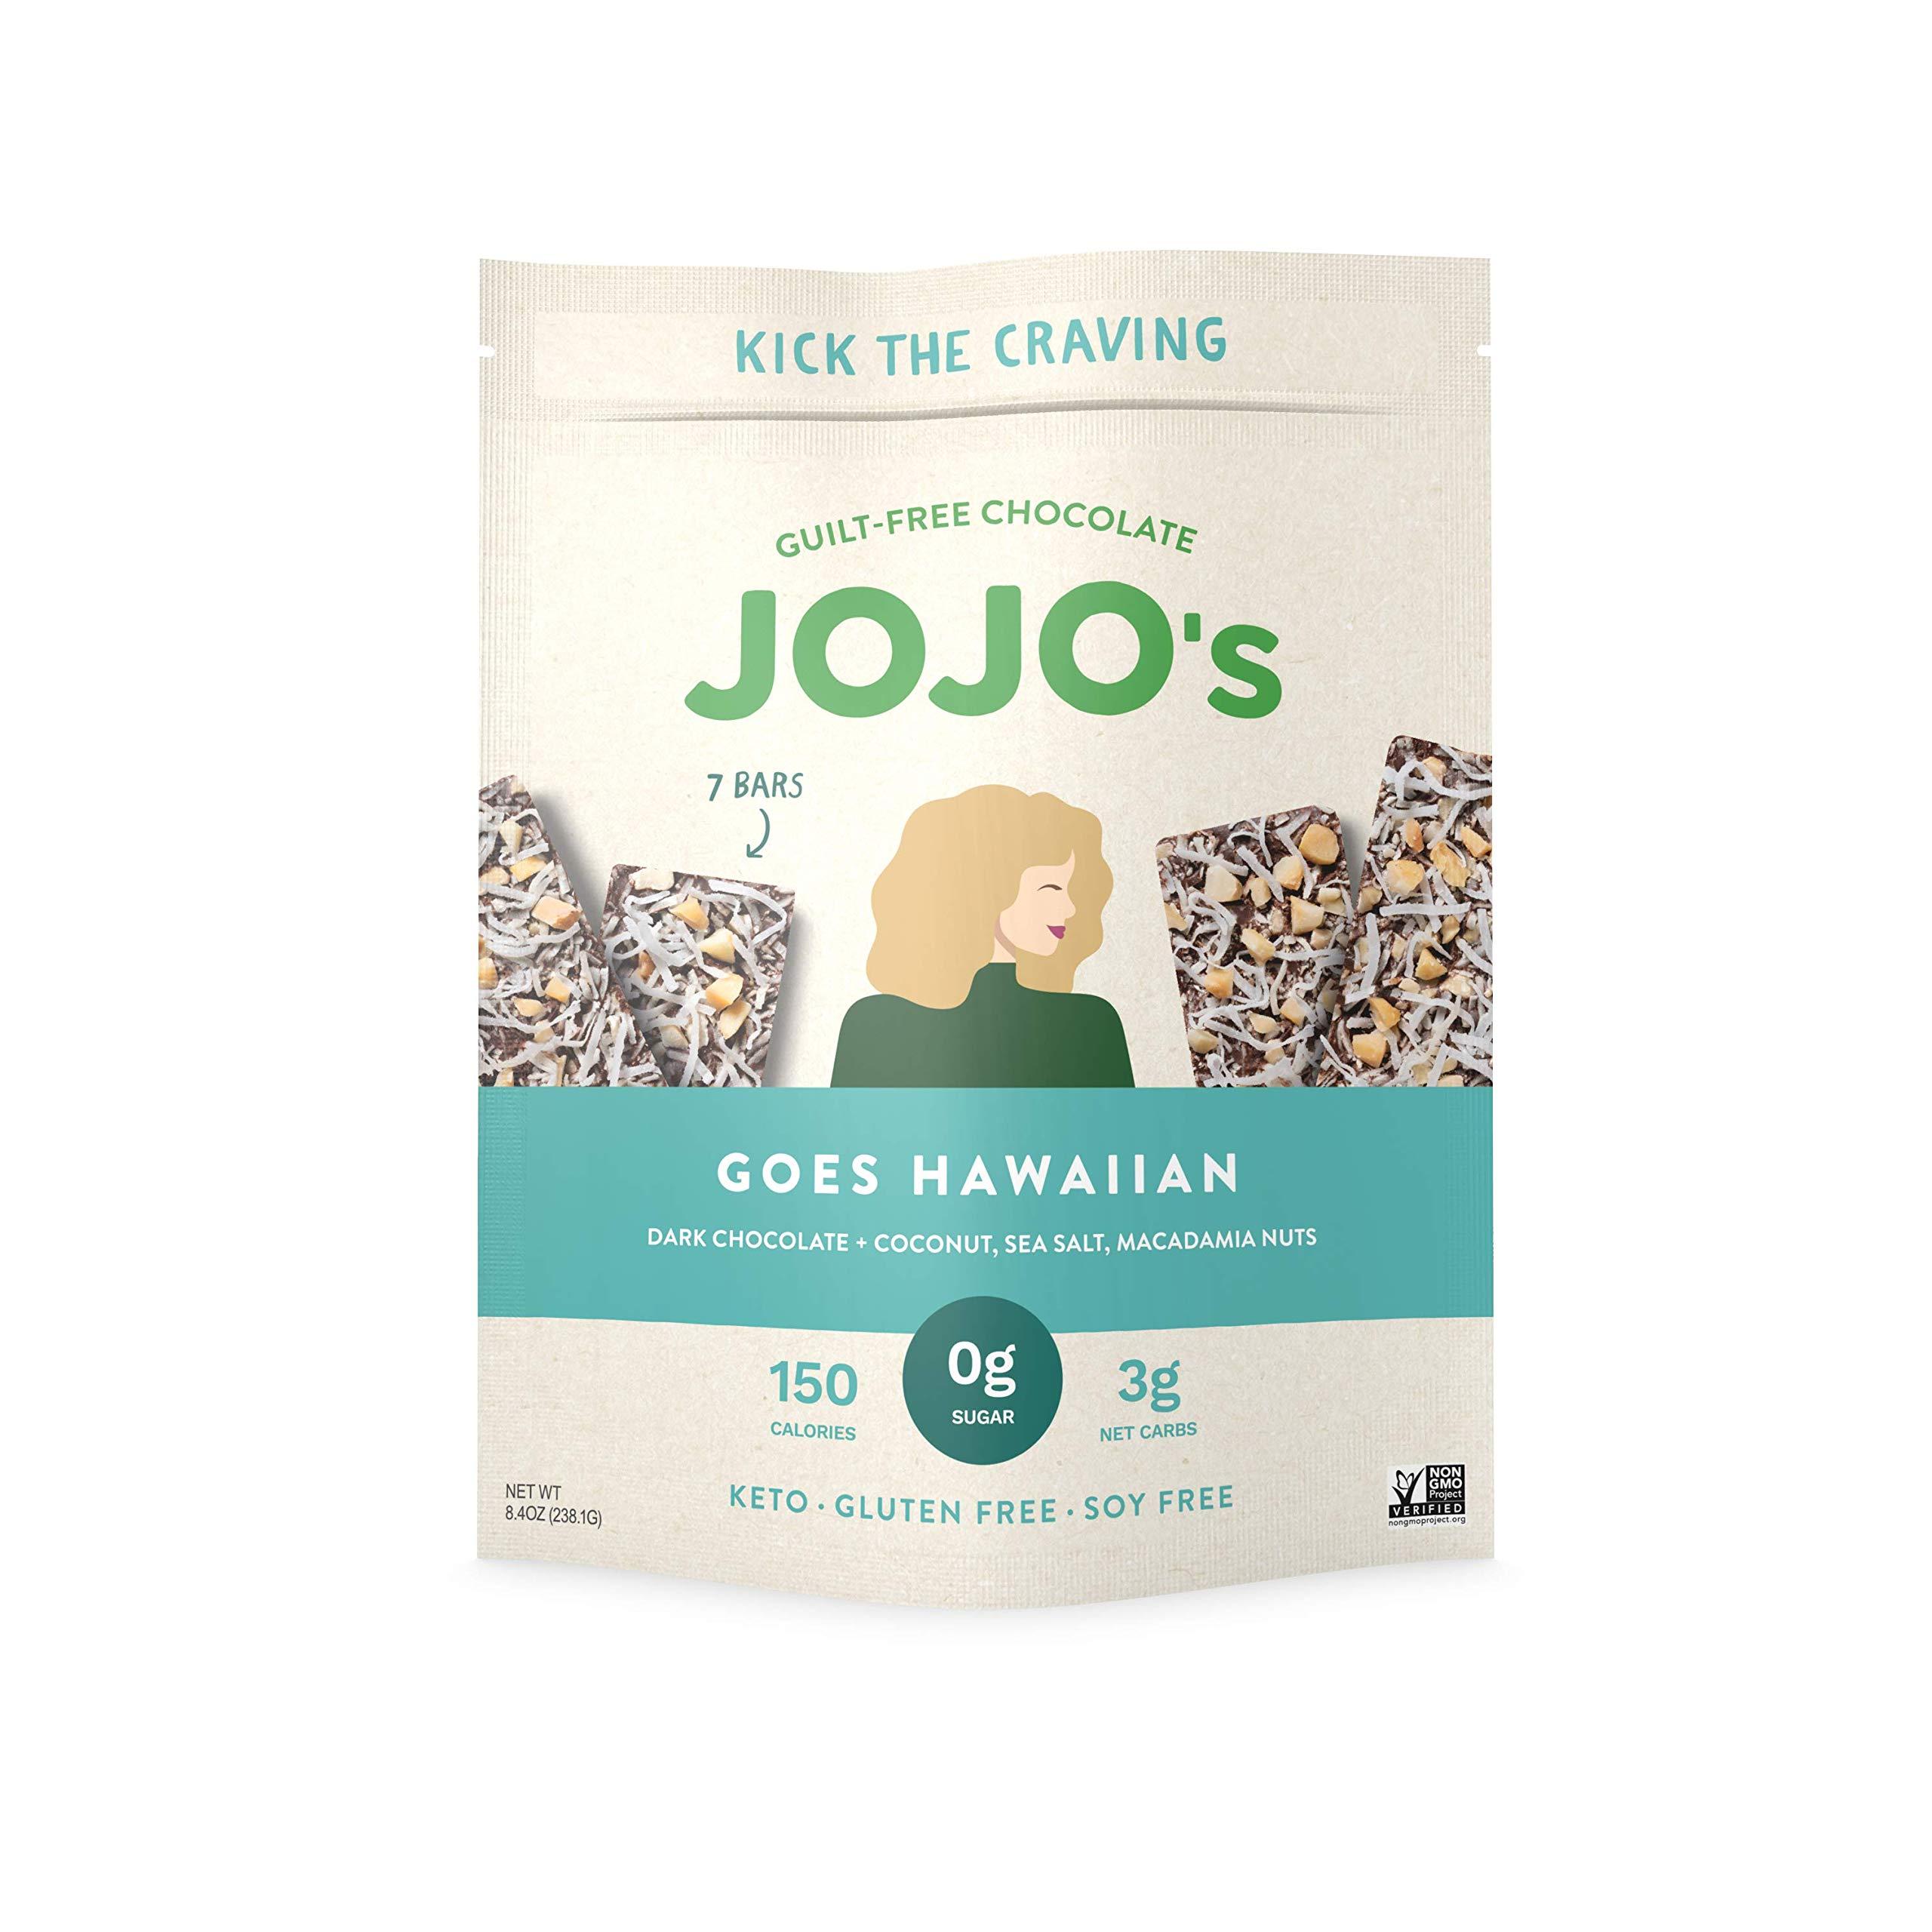 JOJO's Goes Hawaiian Sugar-Free Guilt-Free Chocolate, Macadamia Nuts, Coconut, Sea Salt, and Plant Based Protein - 8.4oz Bag(7 Bars) I Low Carb I KETO I Paleo & Vegan Friendly